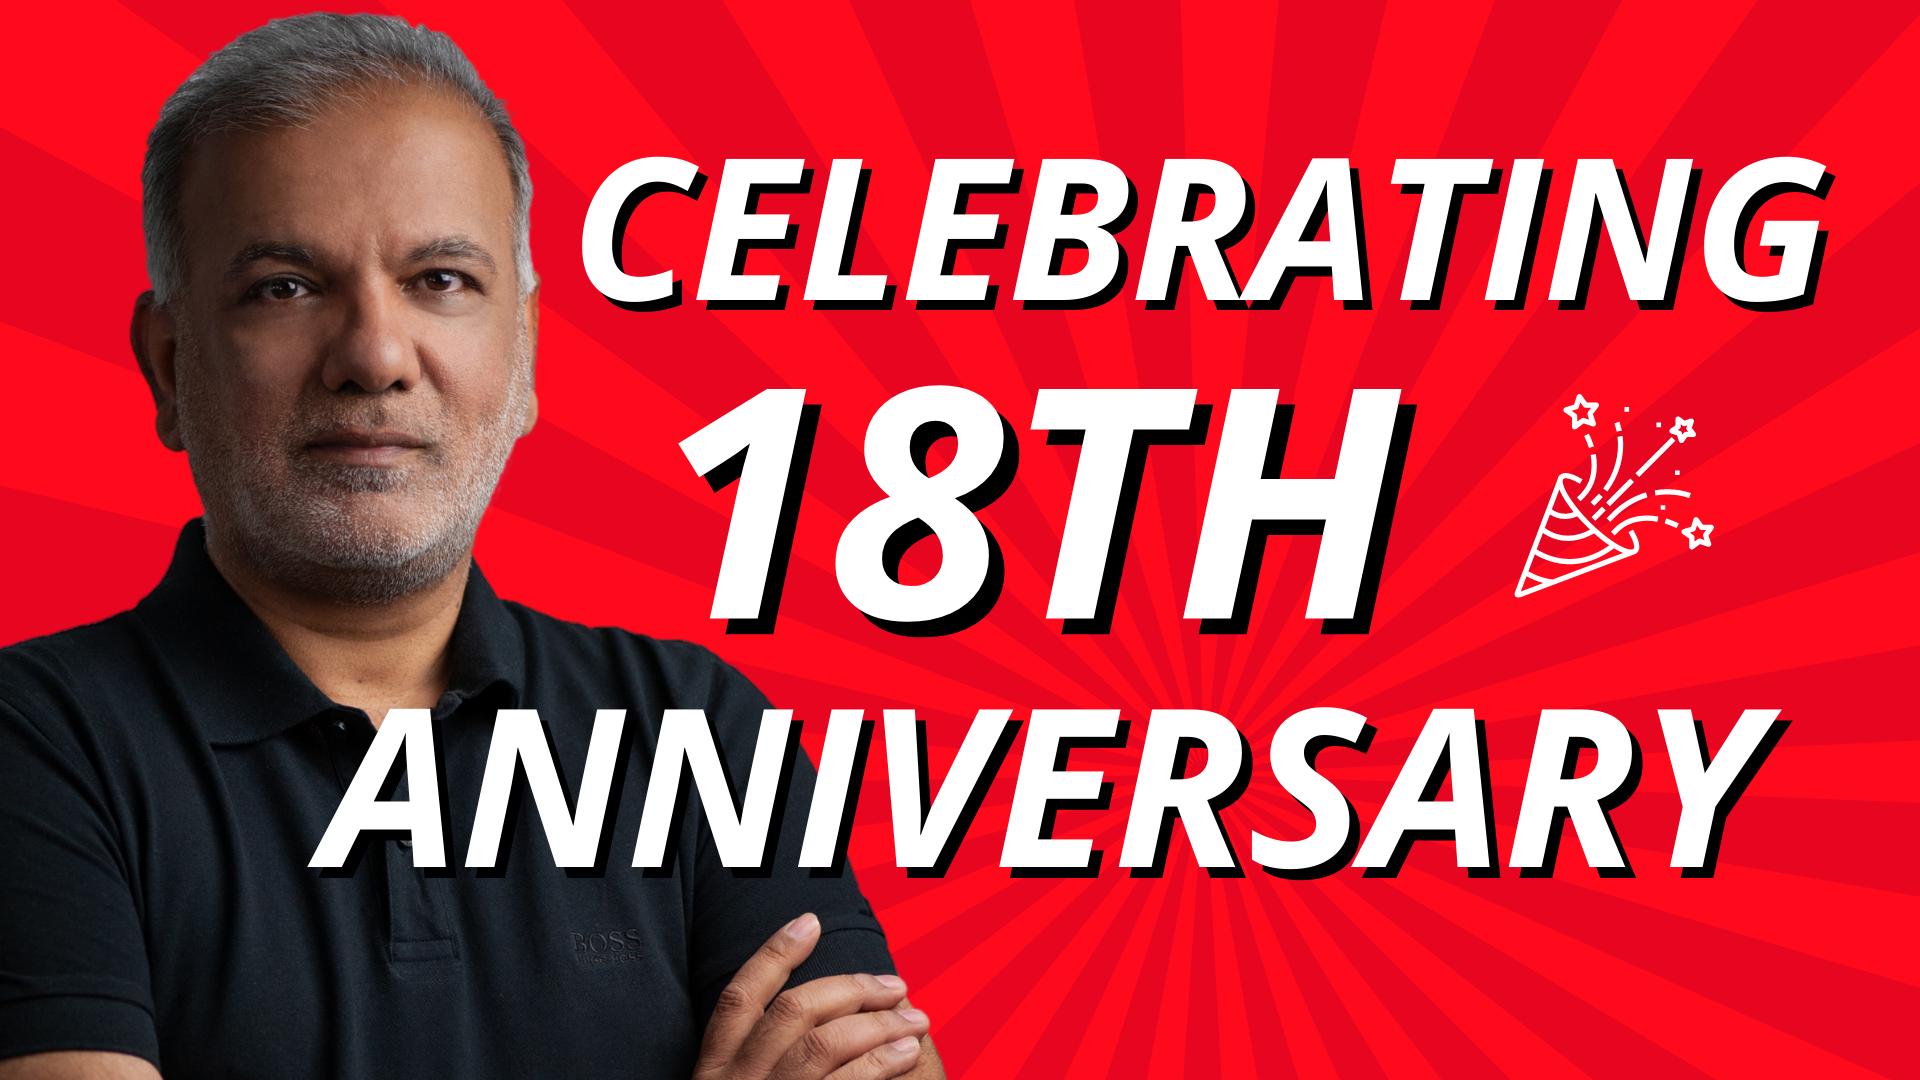 Creative Digital Agency SF Digital Is Celebrating Its 18th Anniversary